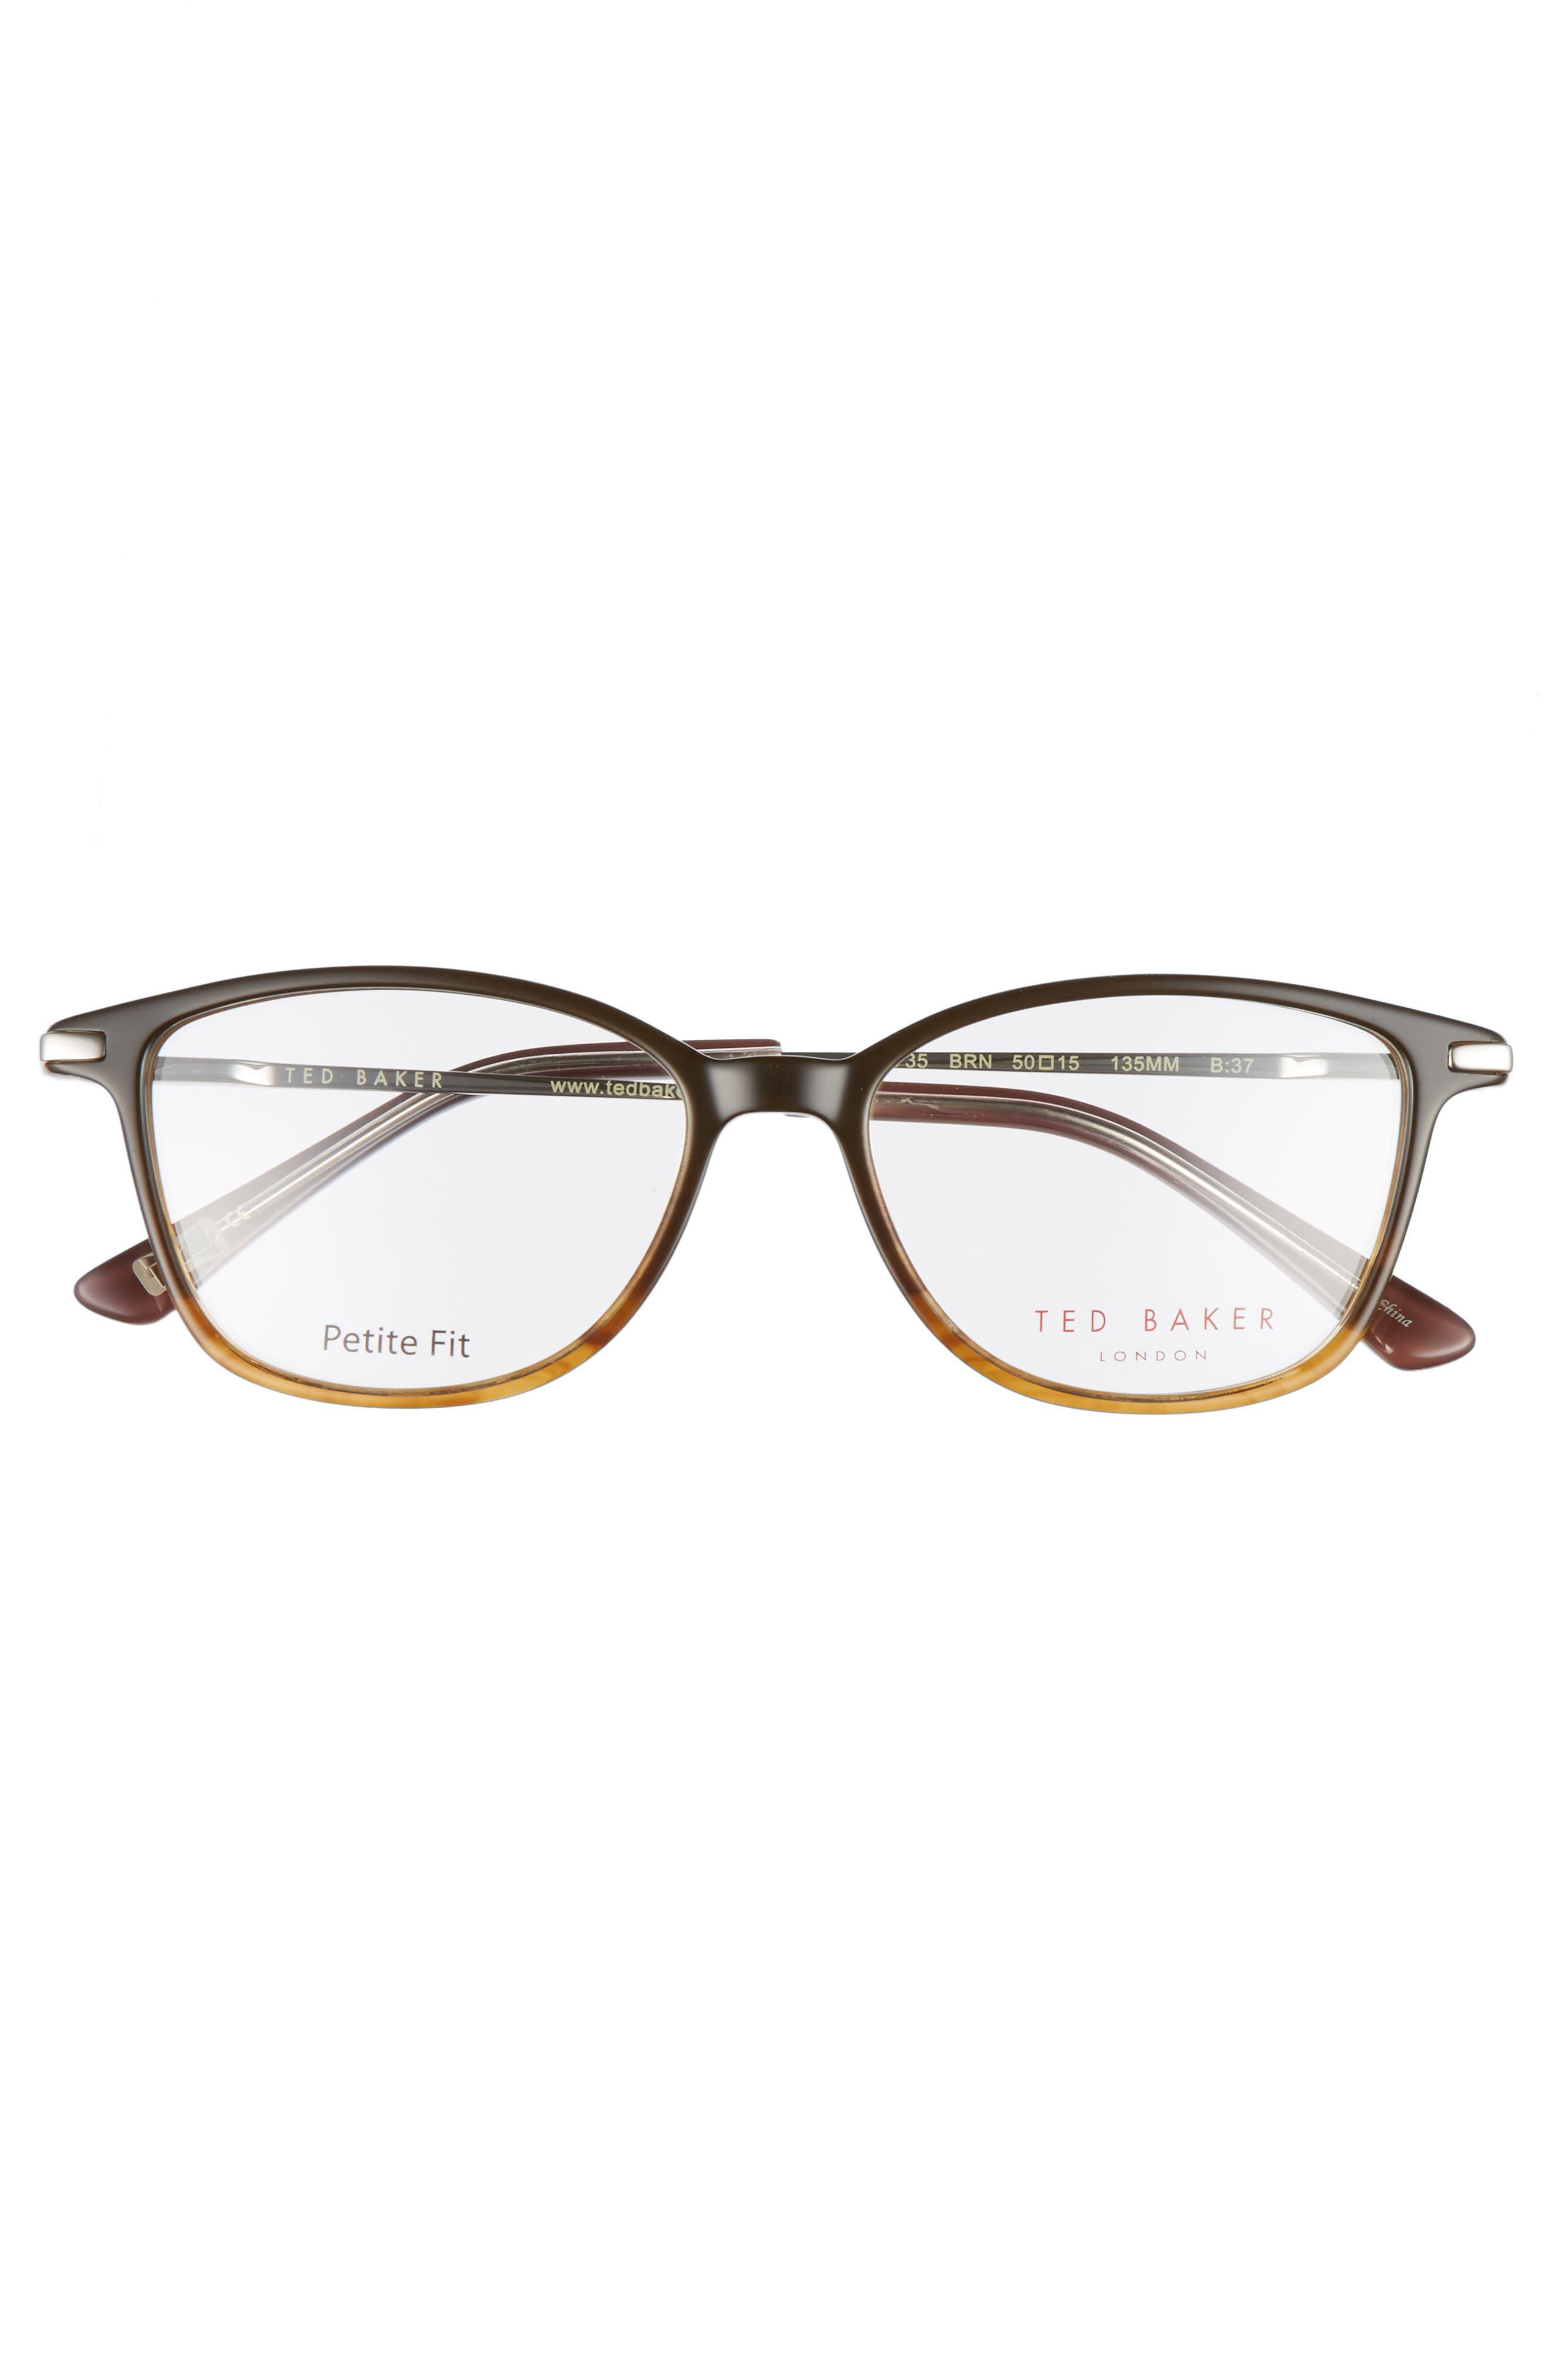 Petite Fit 50mm Optical Glasses,                             Alternate thumbnail 3, color,